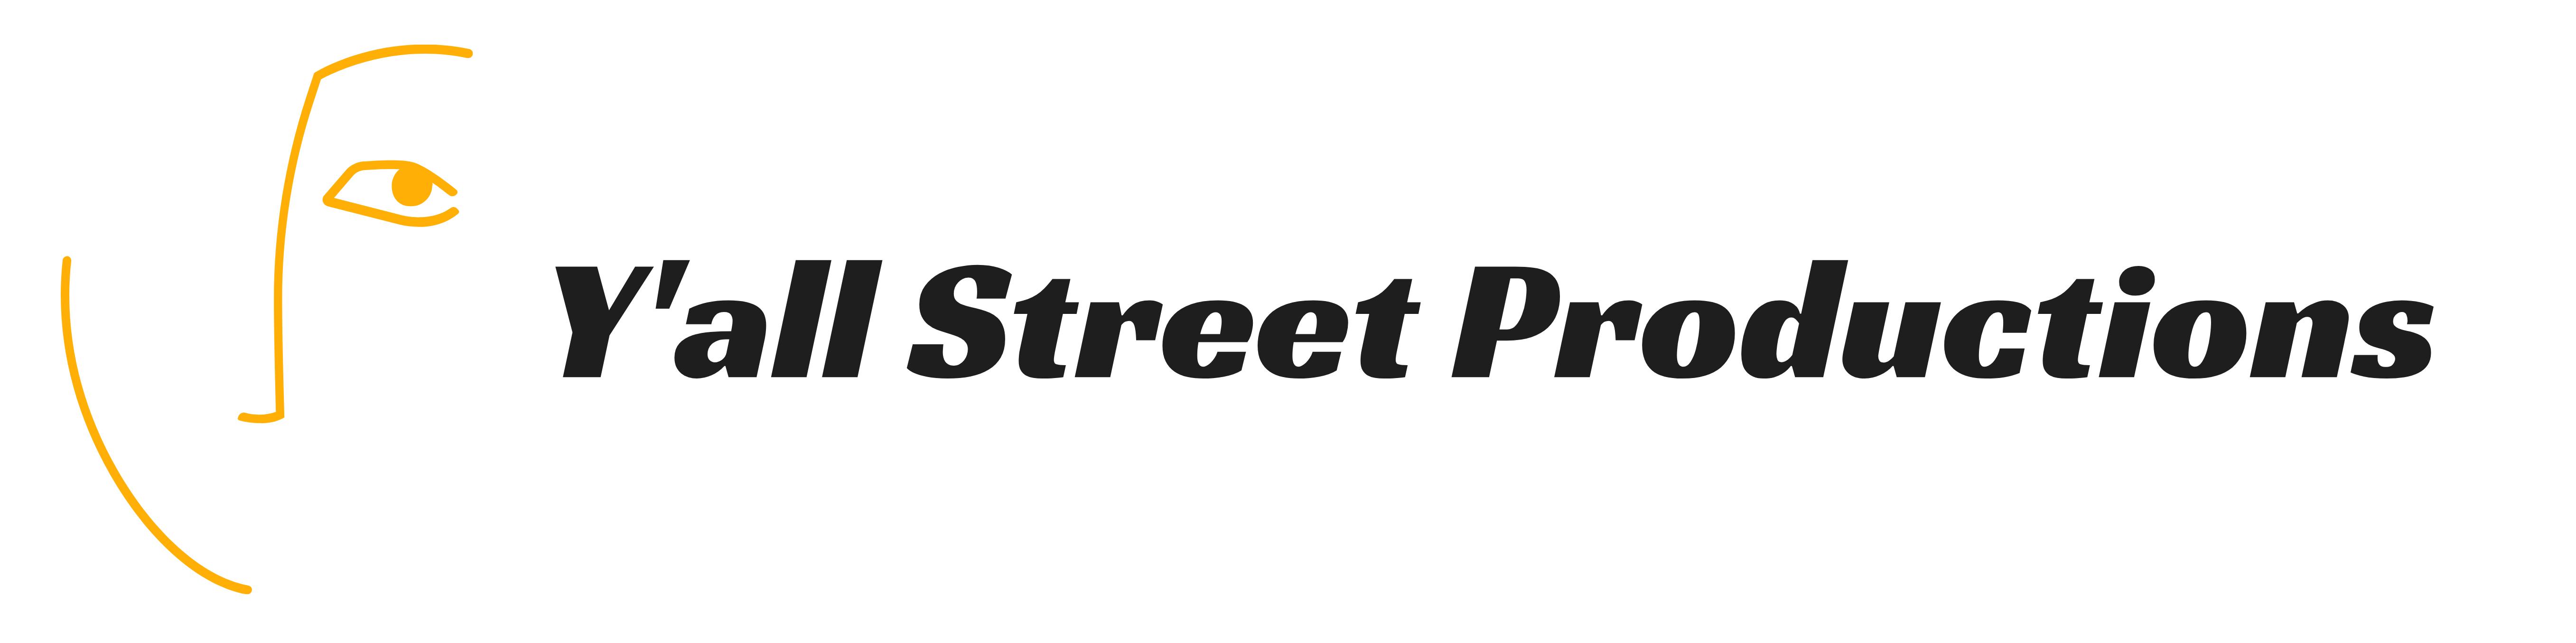 Y'all Street Production Company Logo